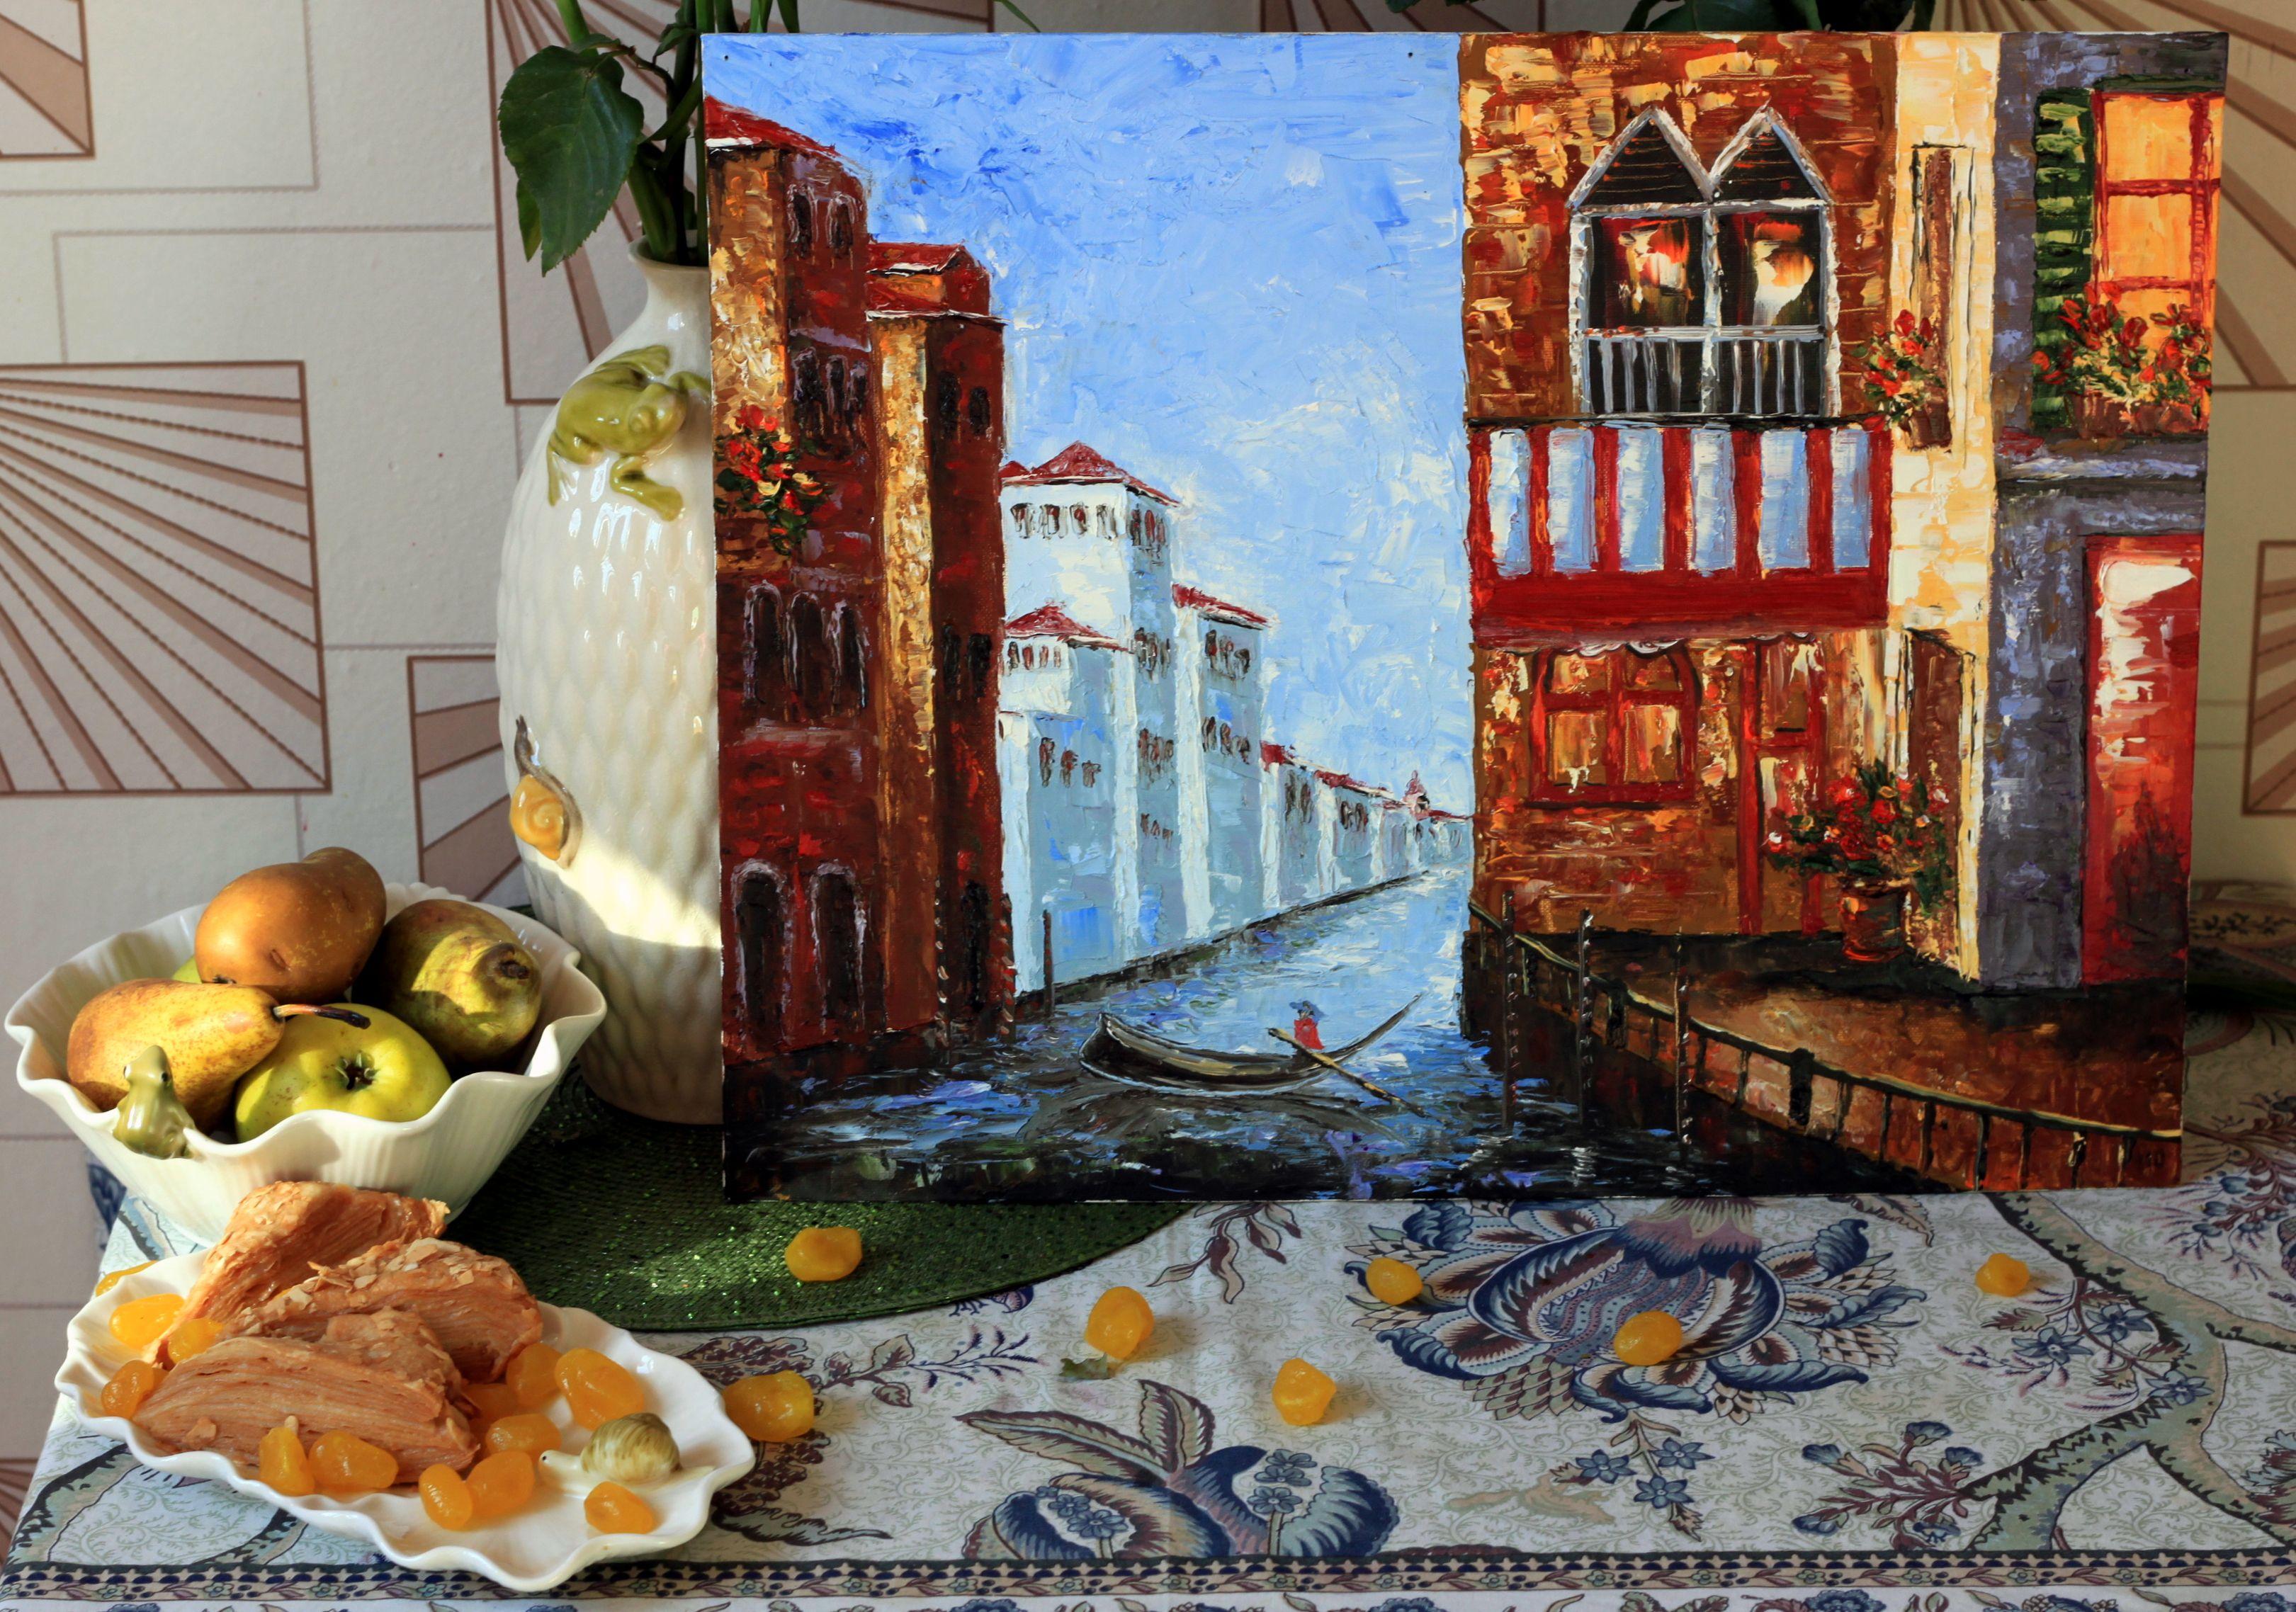 масло гандольер италия канал венеция картина мастихин